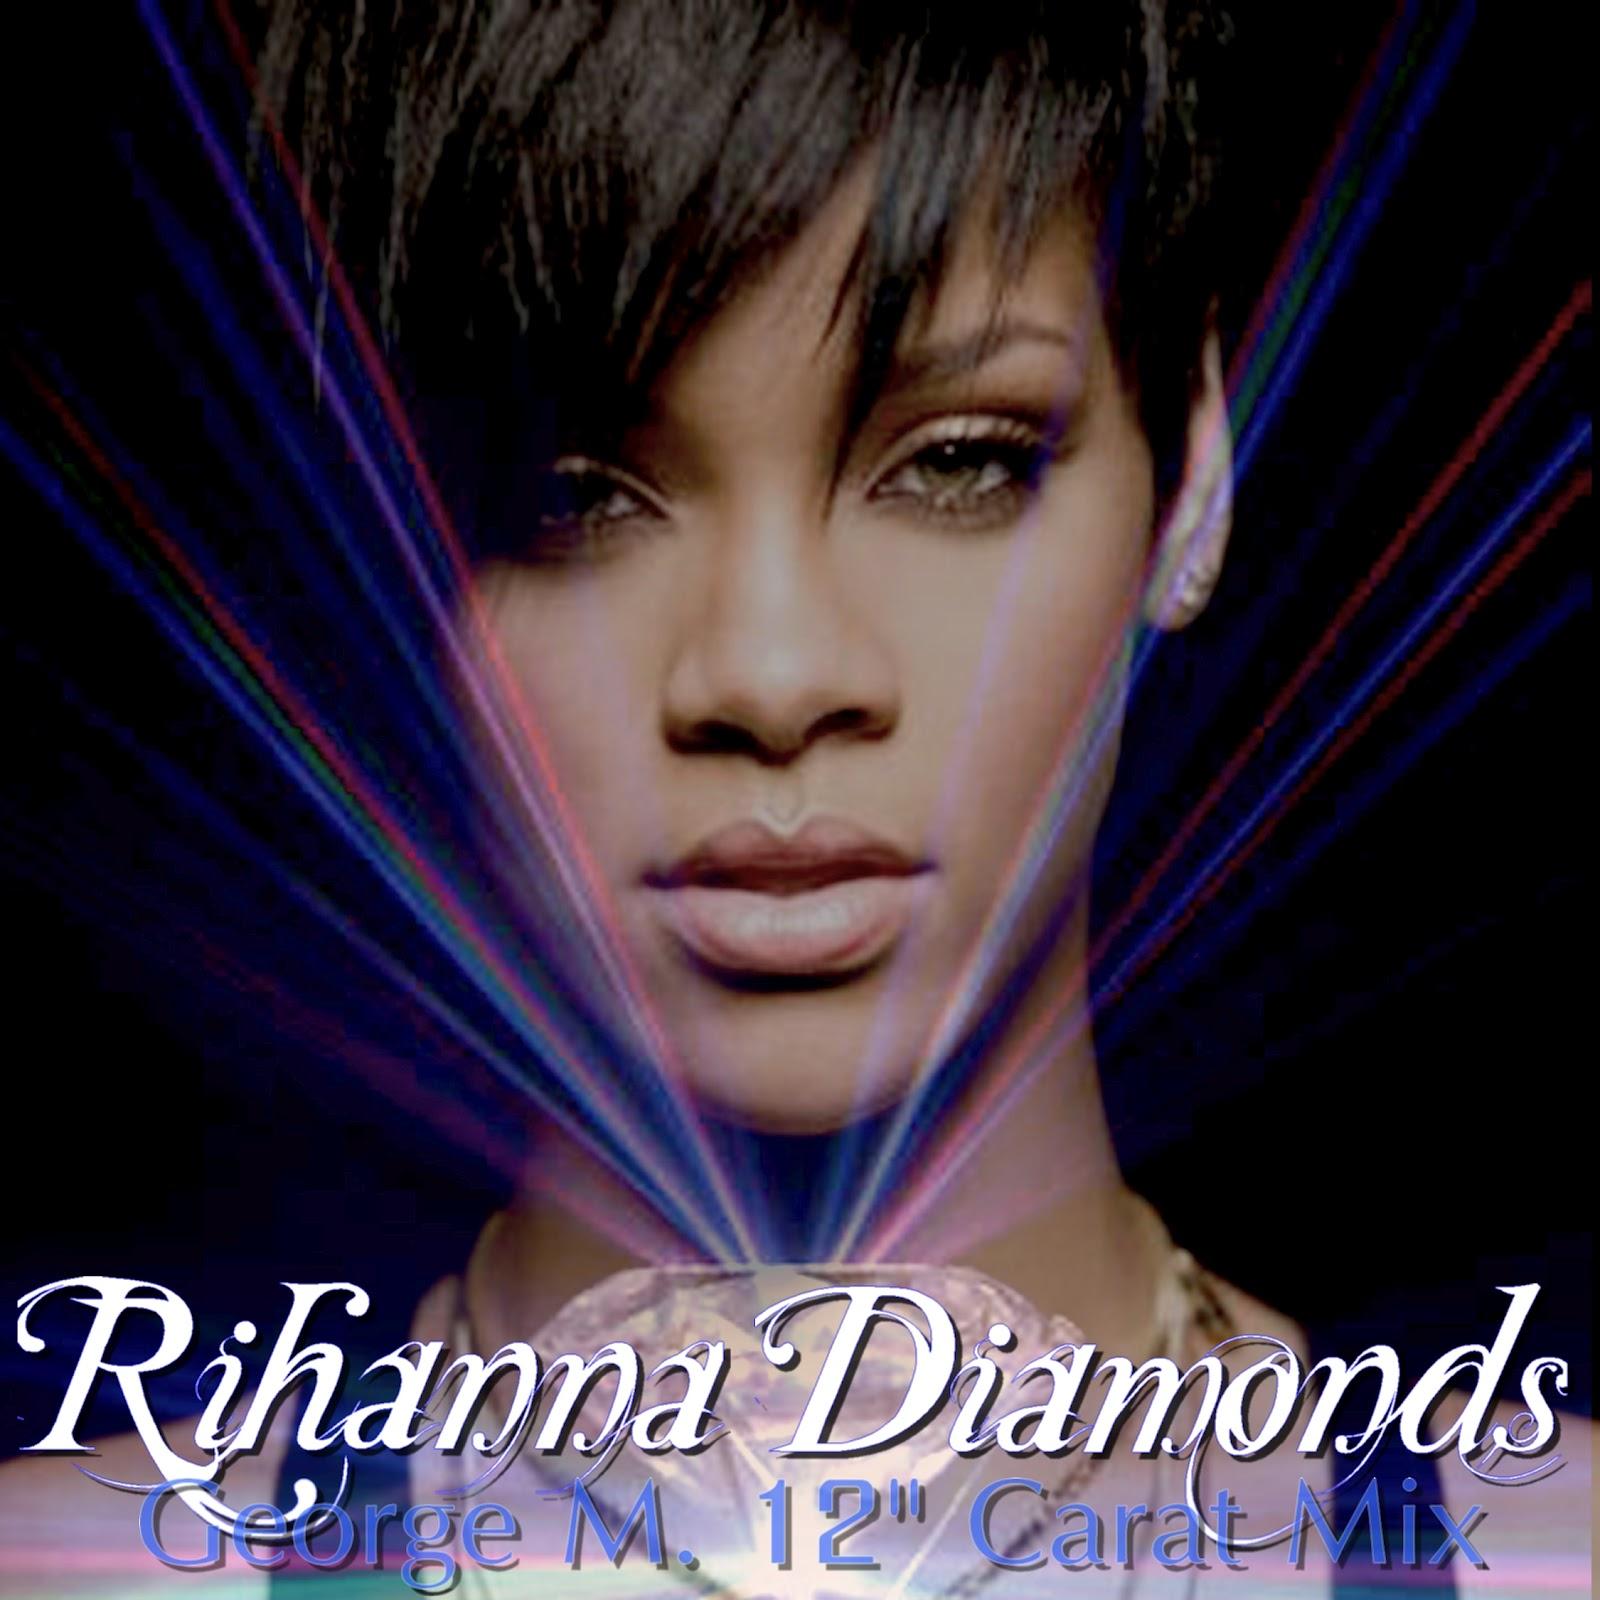 Rihanna - Diamonds - Unknown album